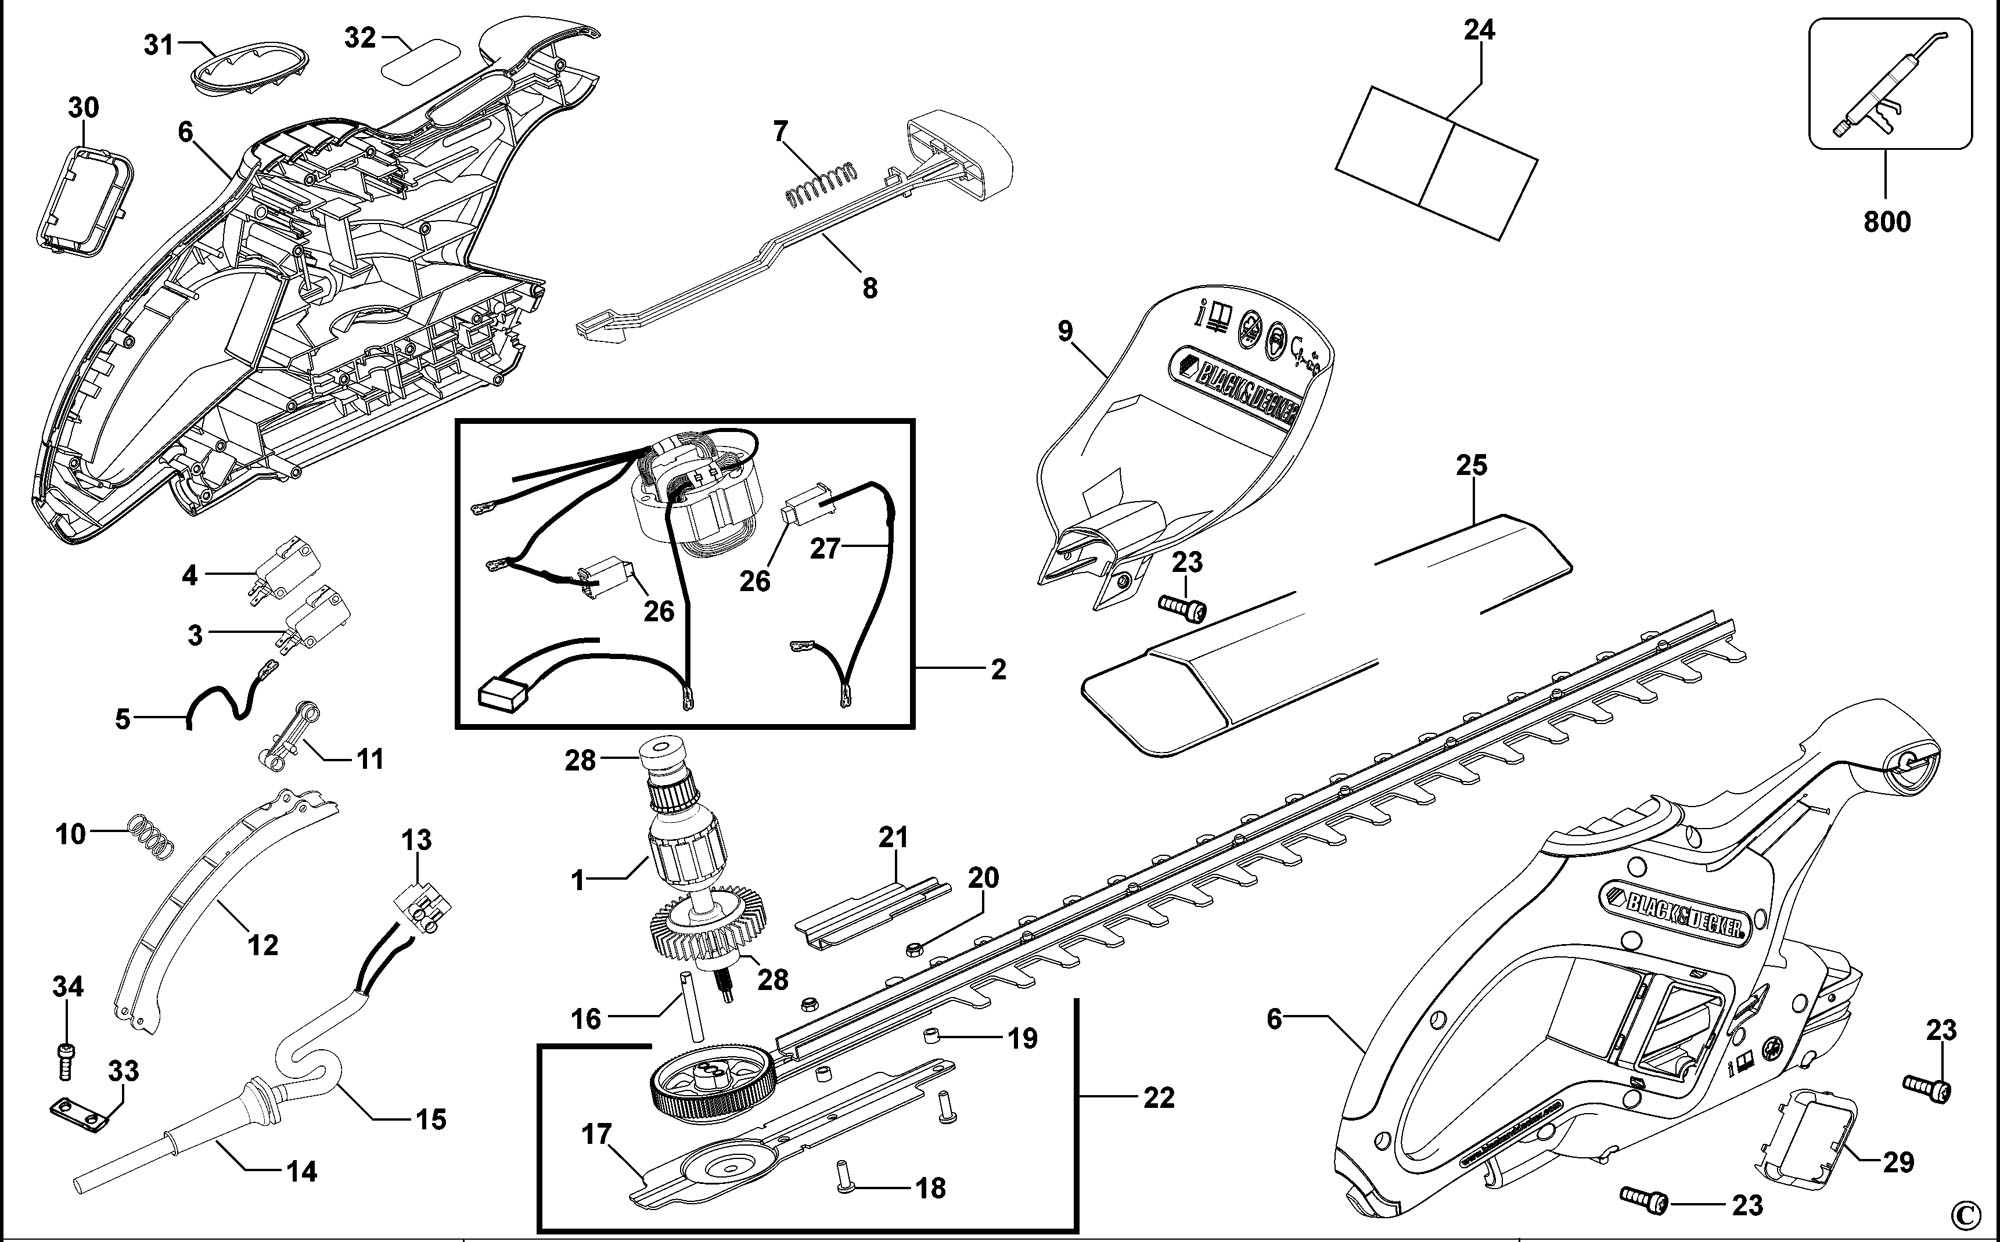 Spares For Black Amp Decker Gt502 Hedgetrimmer Type 2